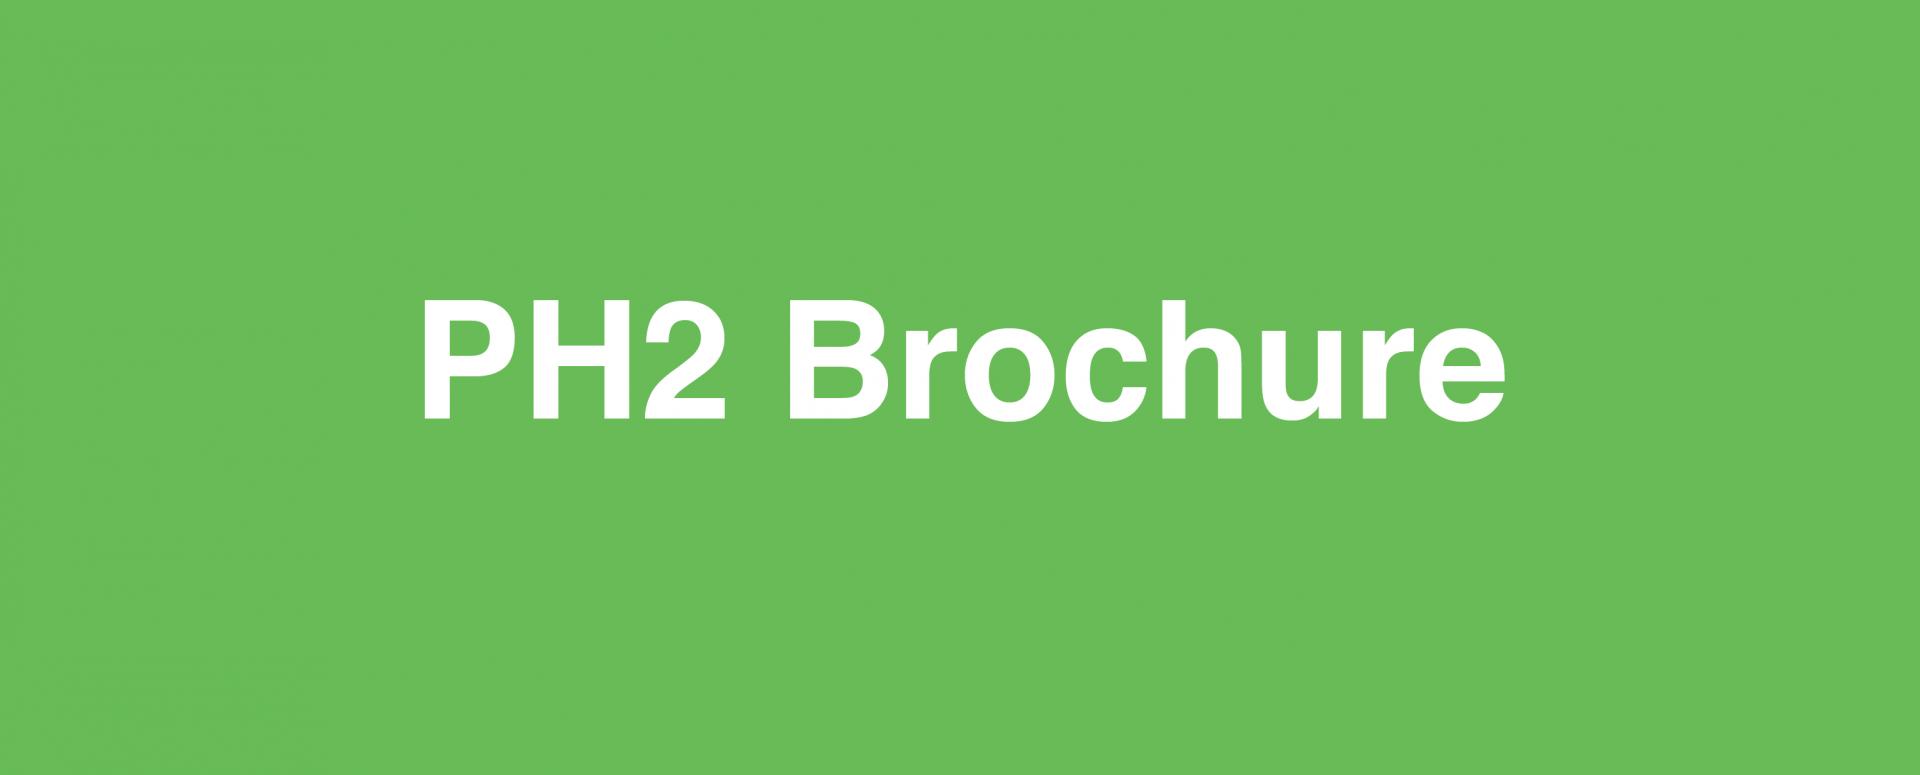 brochure button-phone-01